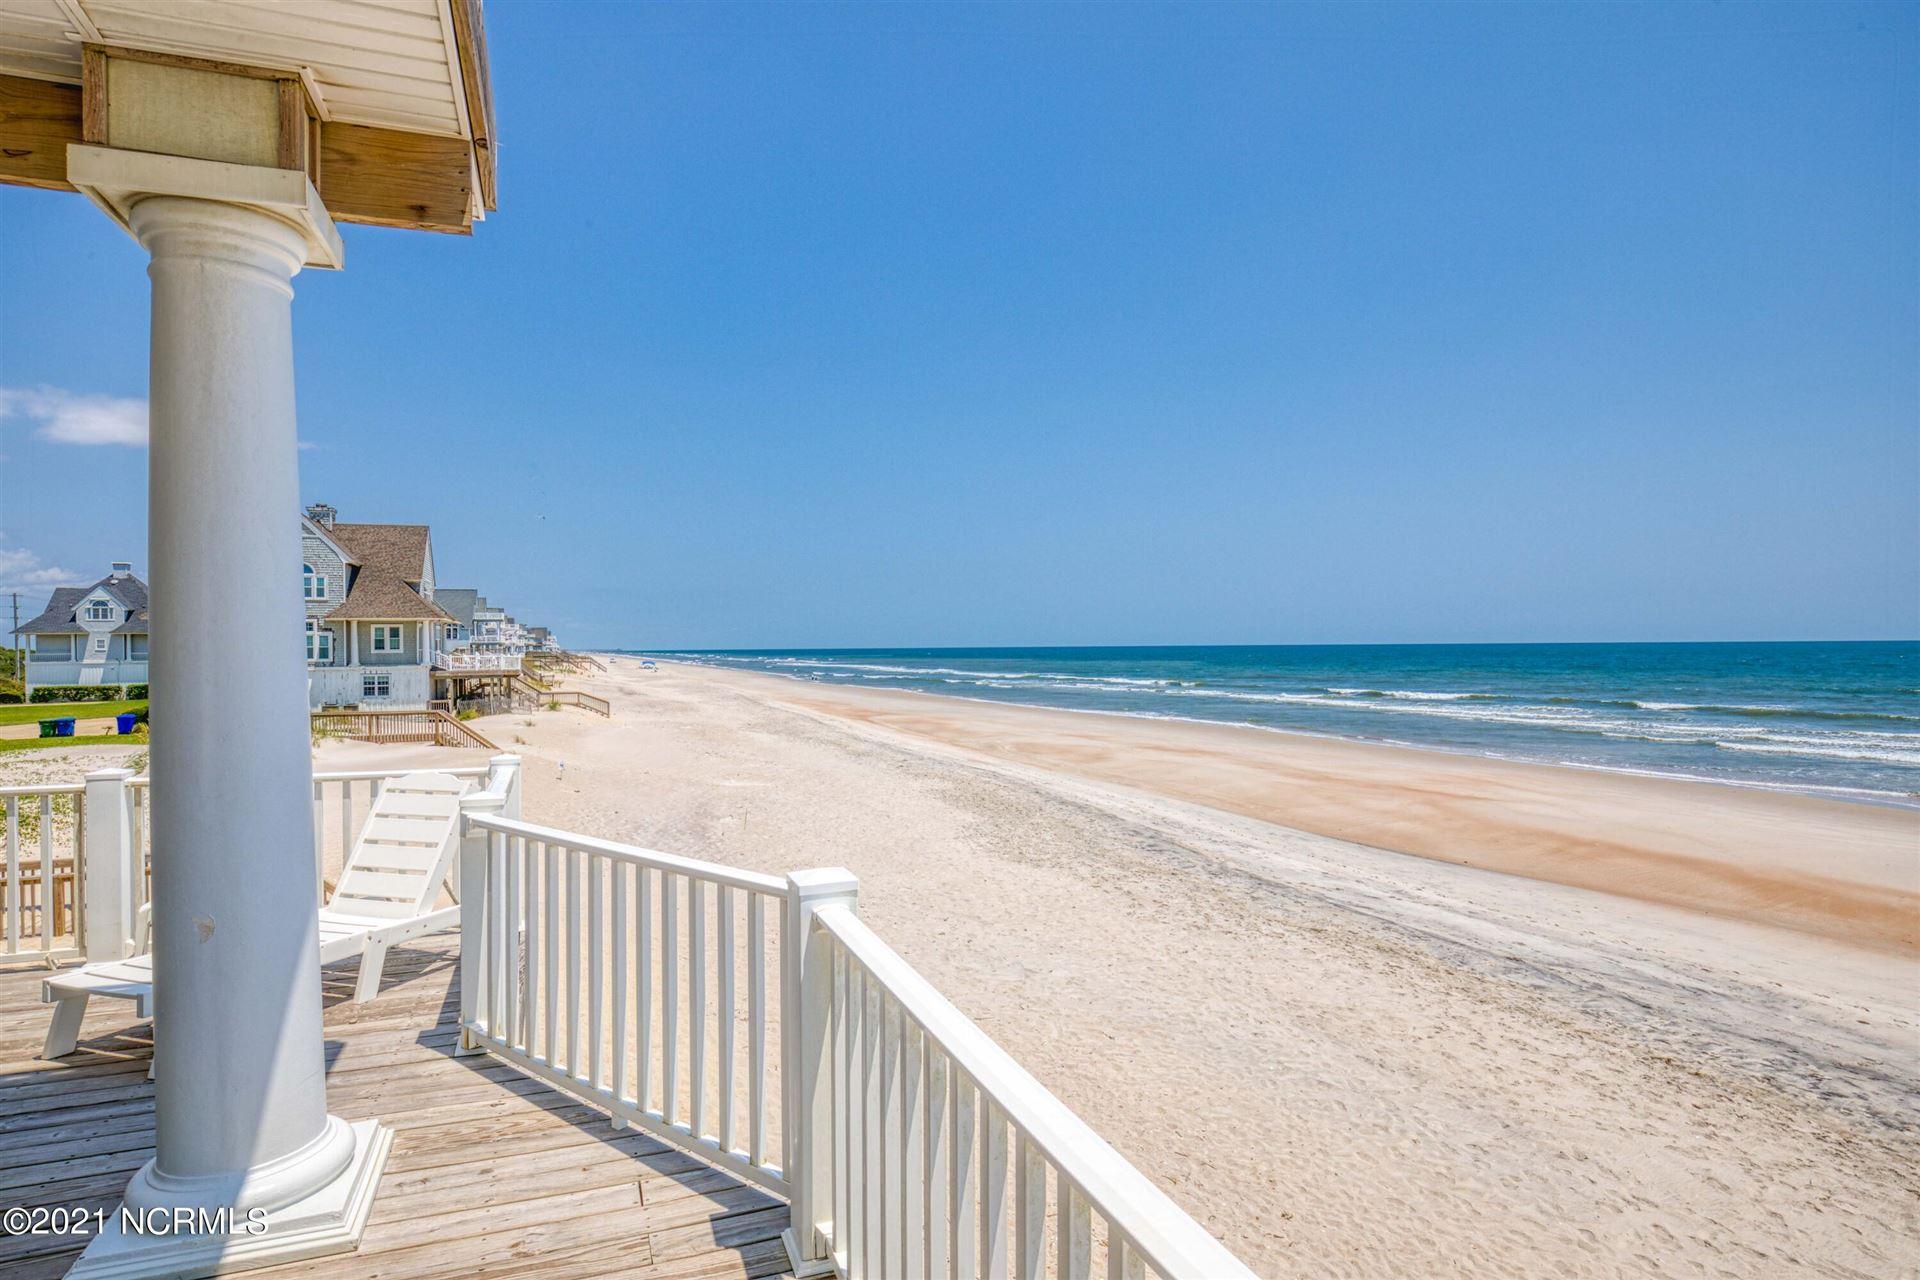 Photo of 4192-4194 Island Drive, North Topsail Beach, NC 28460 (MLS # 100293228)